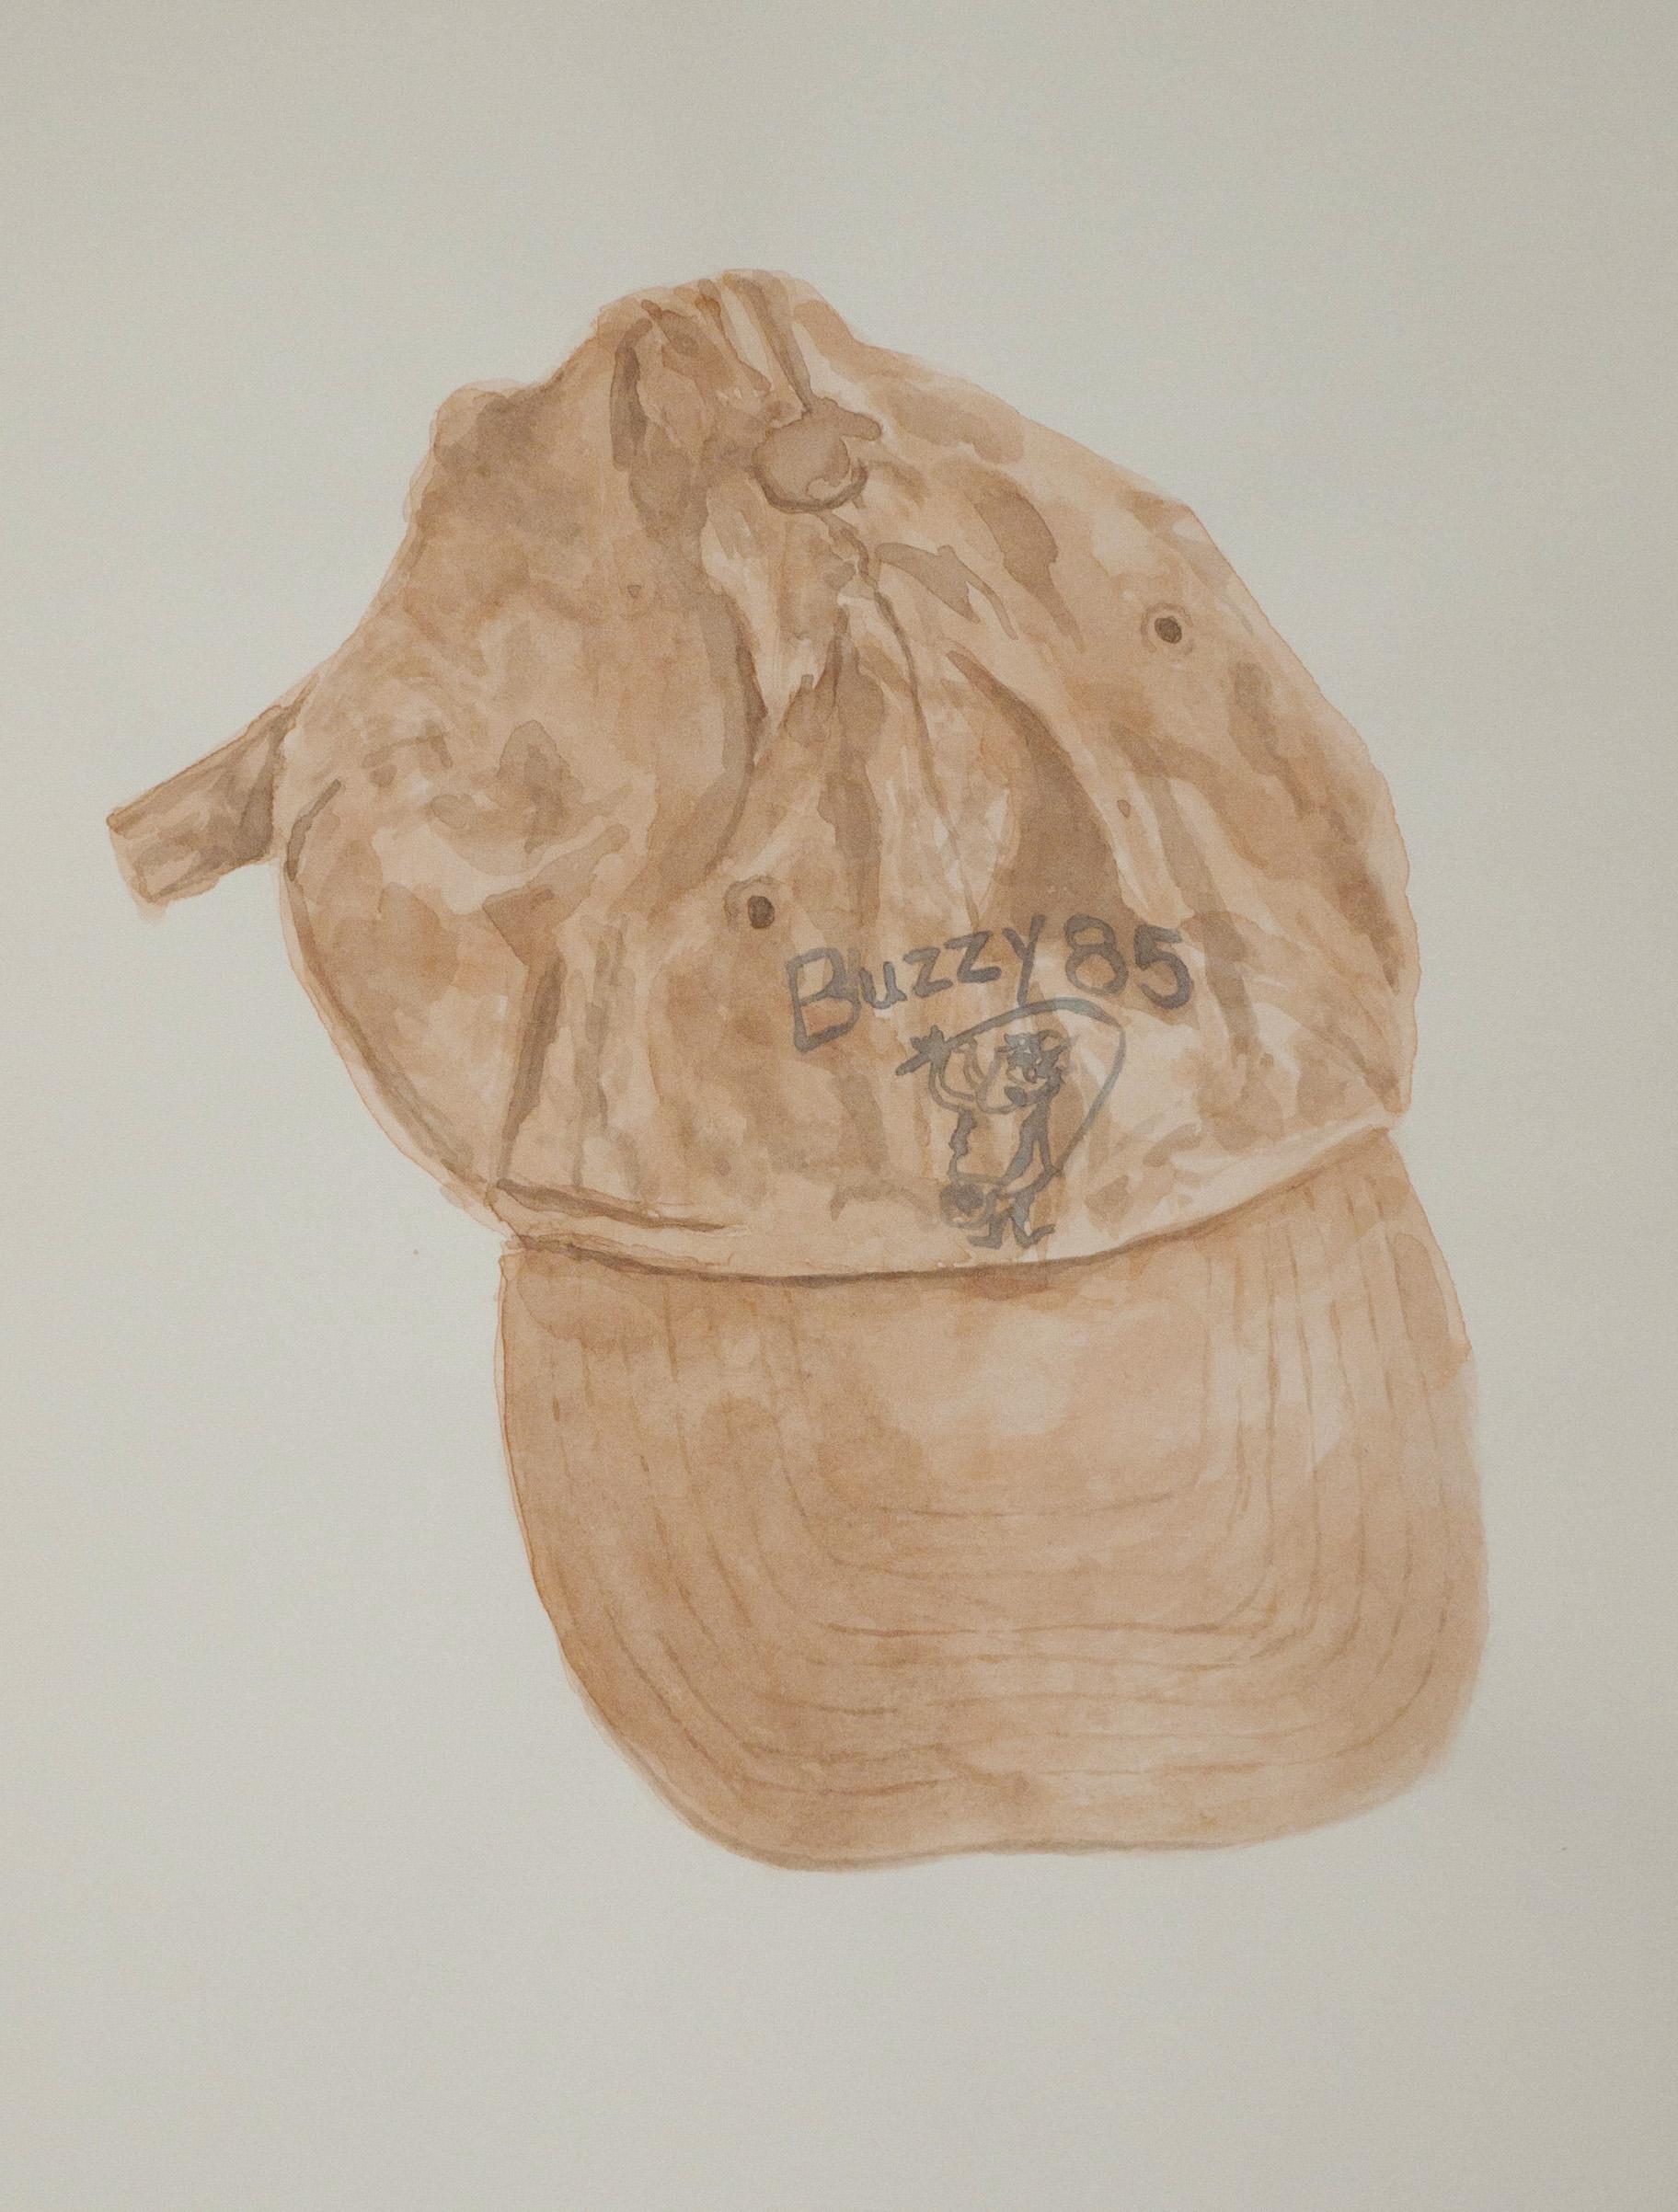 Buzzy Hat.JPG